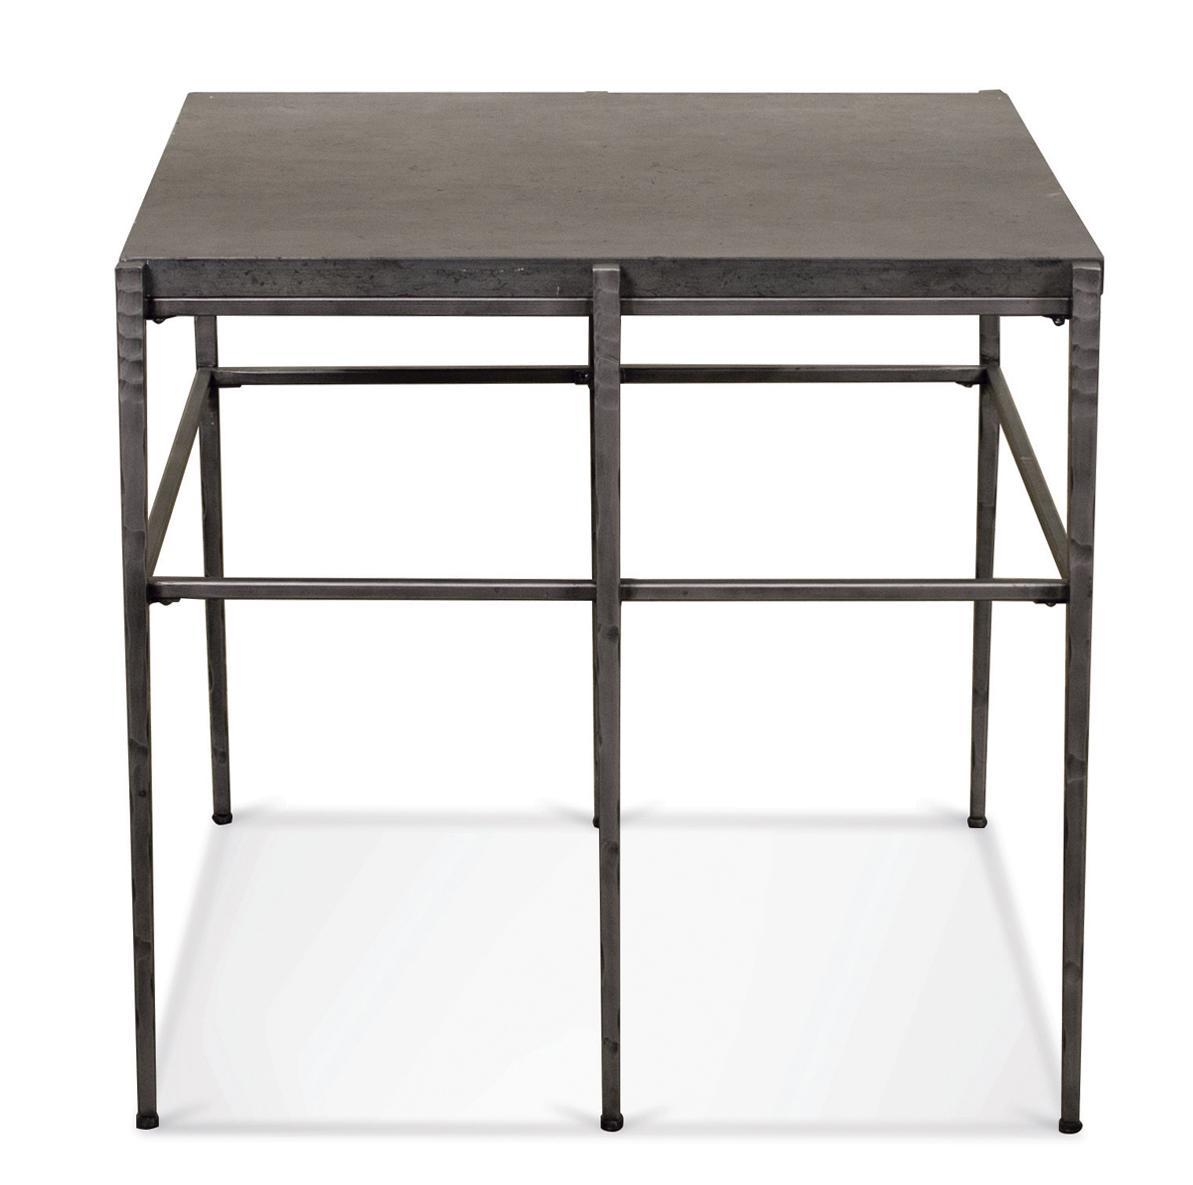 Riverside Furniture Lorraine Square End Table W/ Metal Base